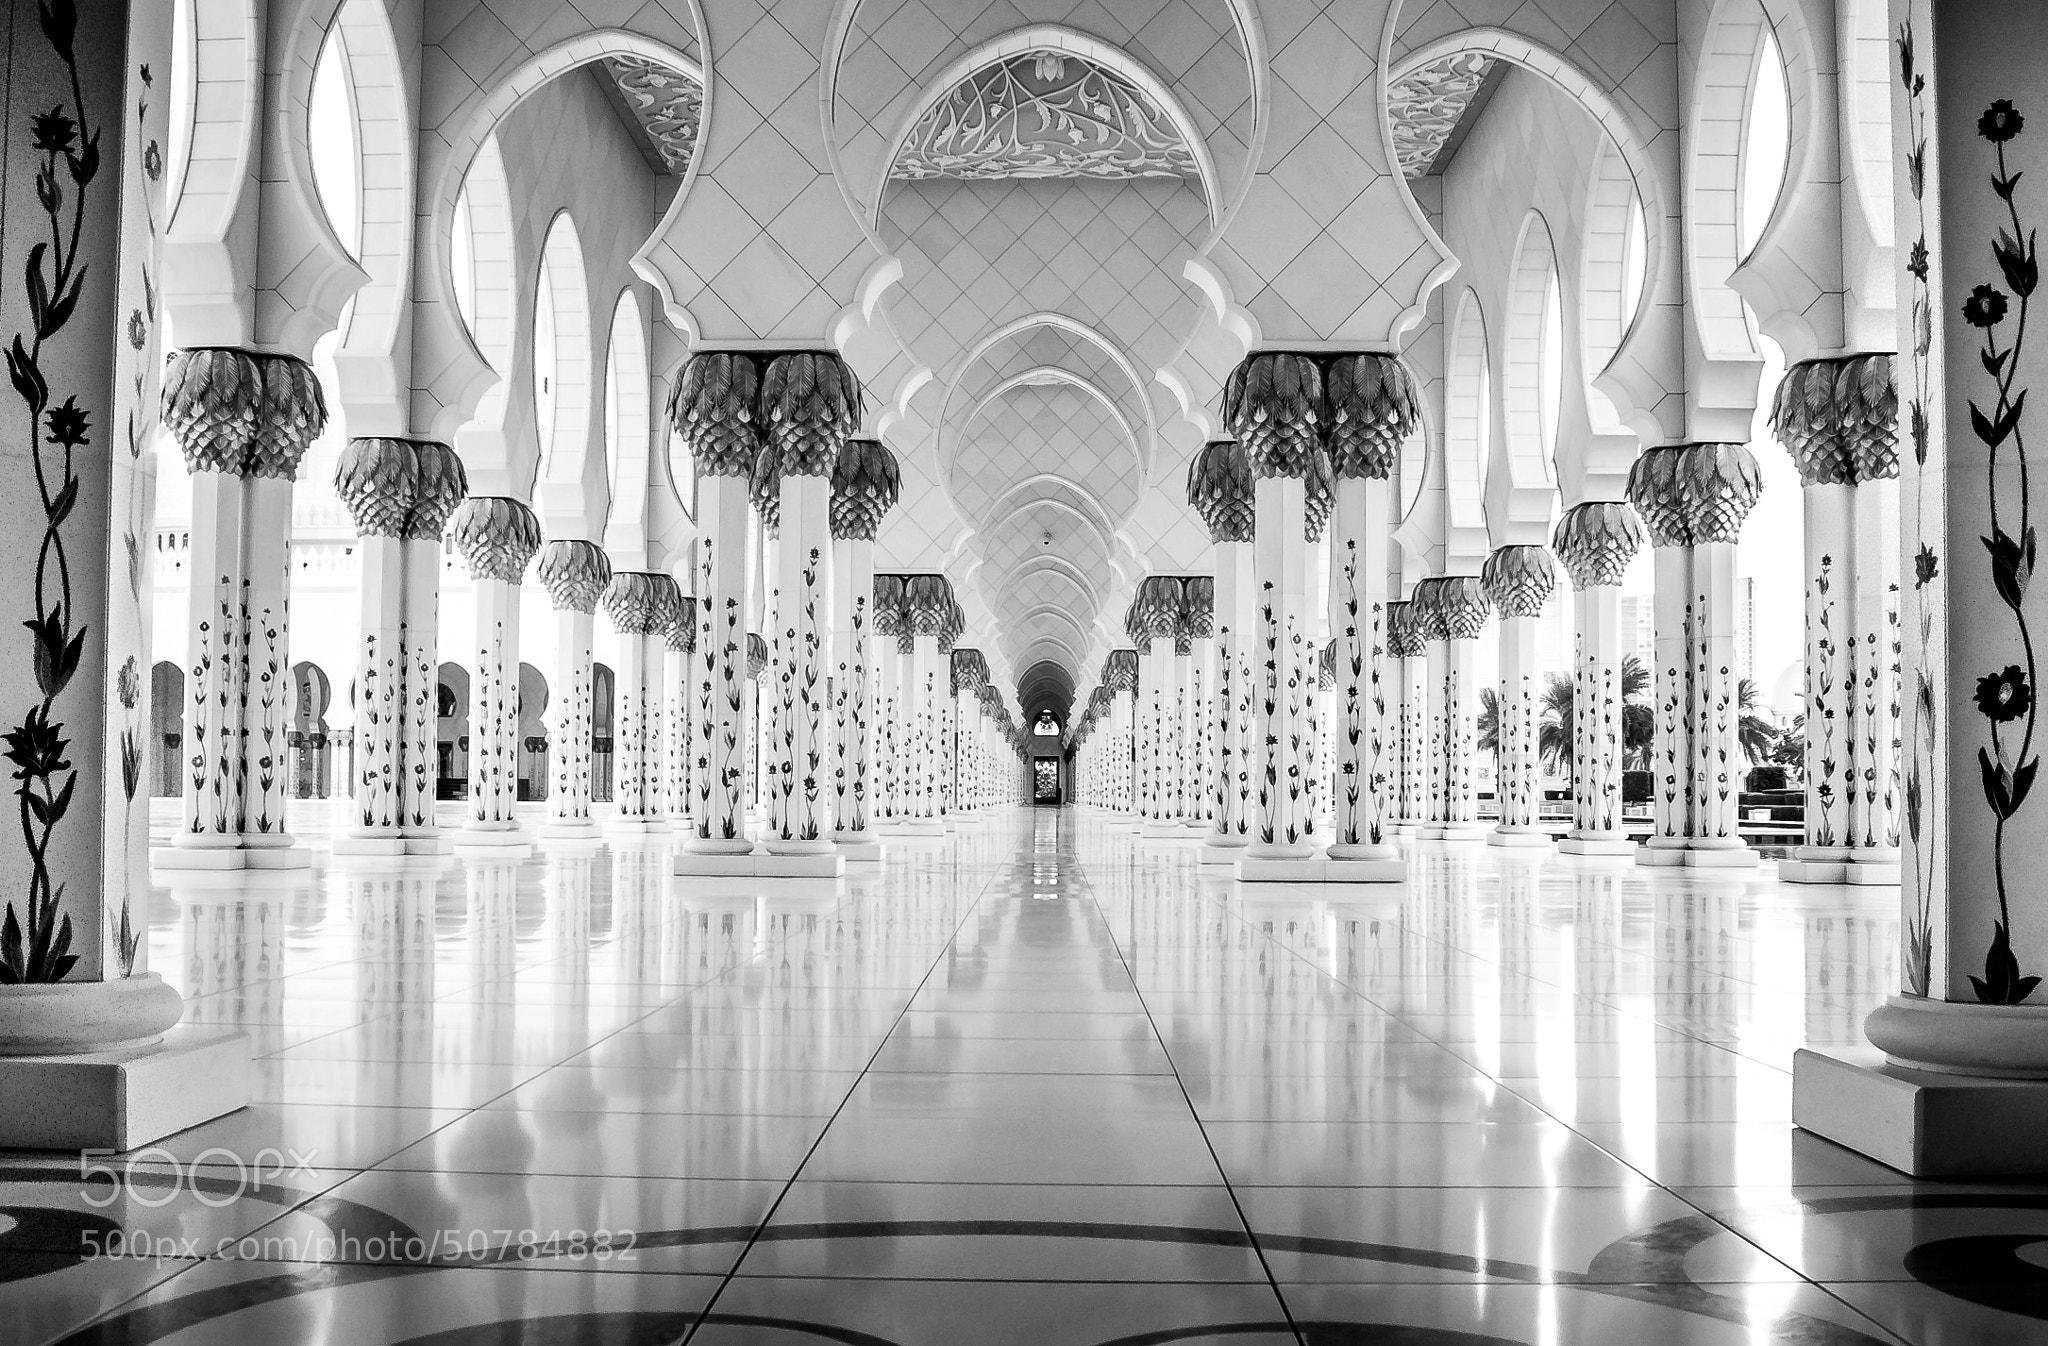 Photograph The Pillars - Grand Mosque, Abu Dhabi by julian john on 500px